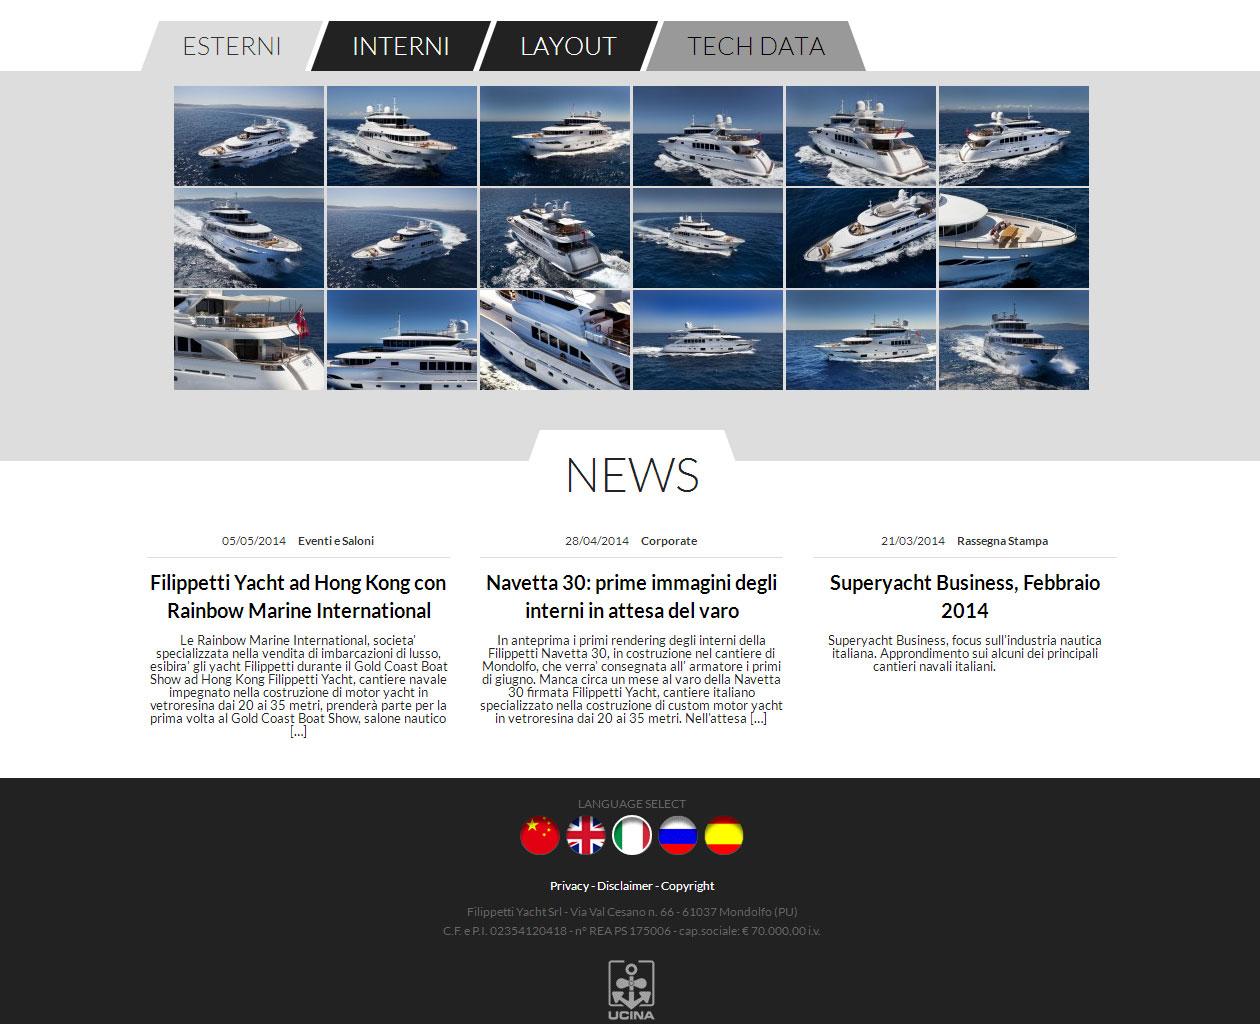 Filippetti Yacht, luxury yacht